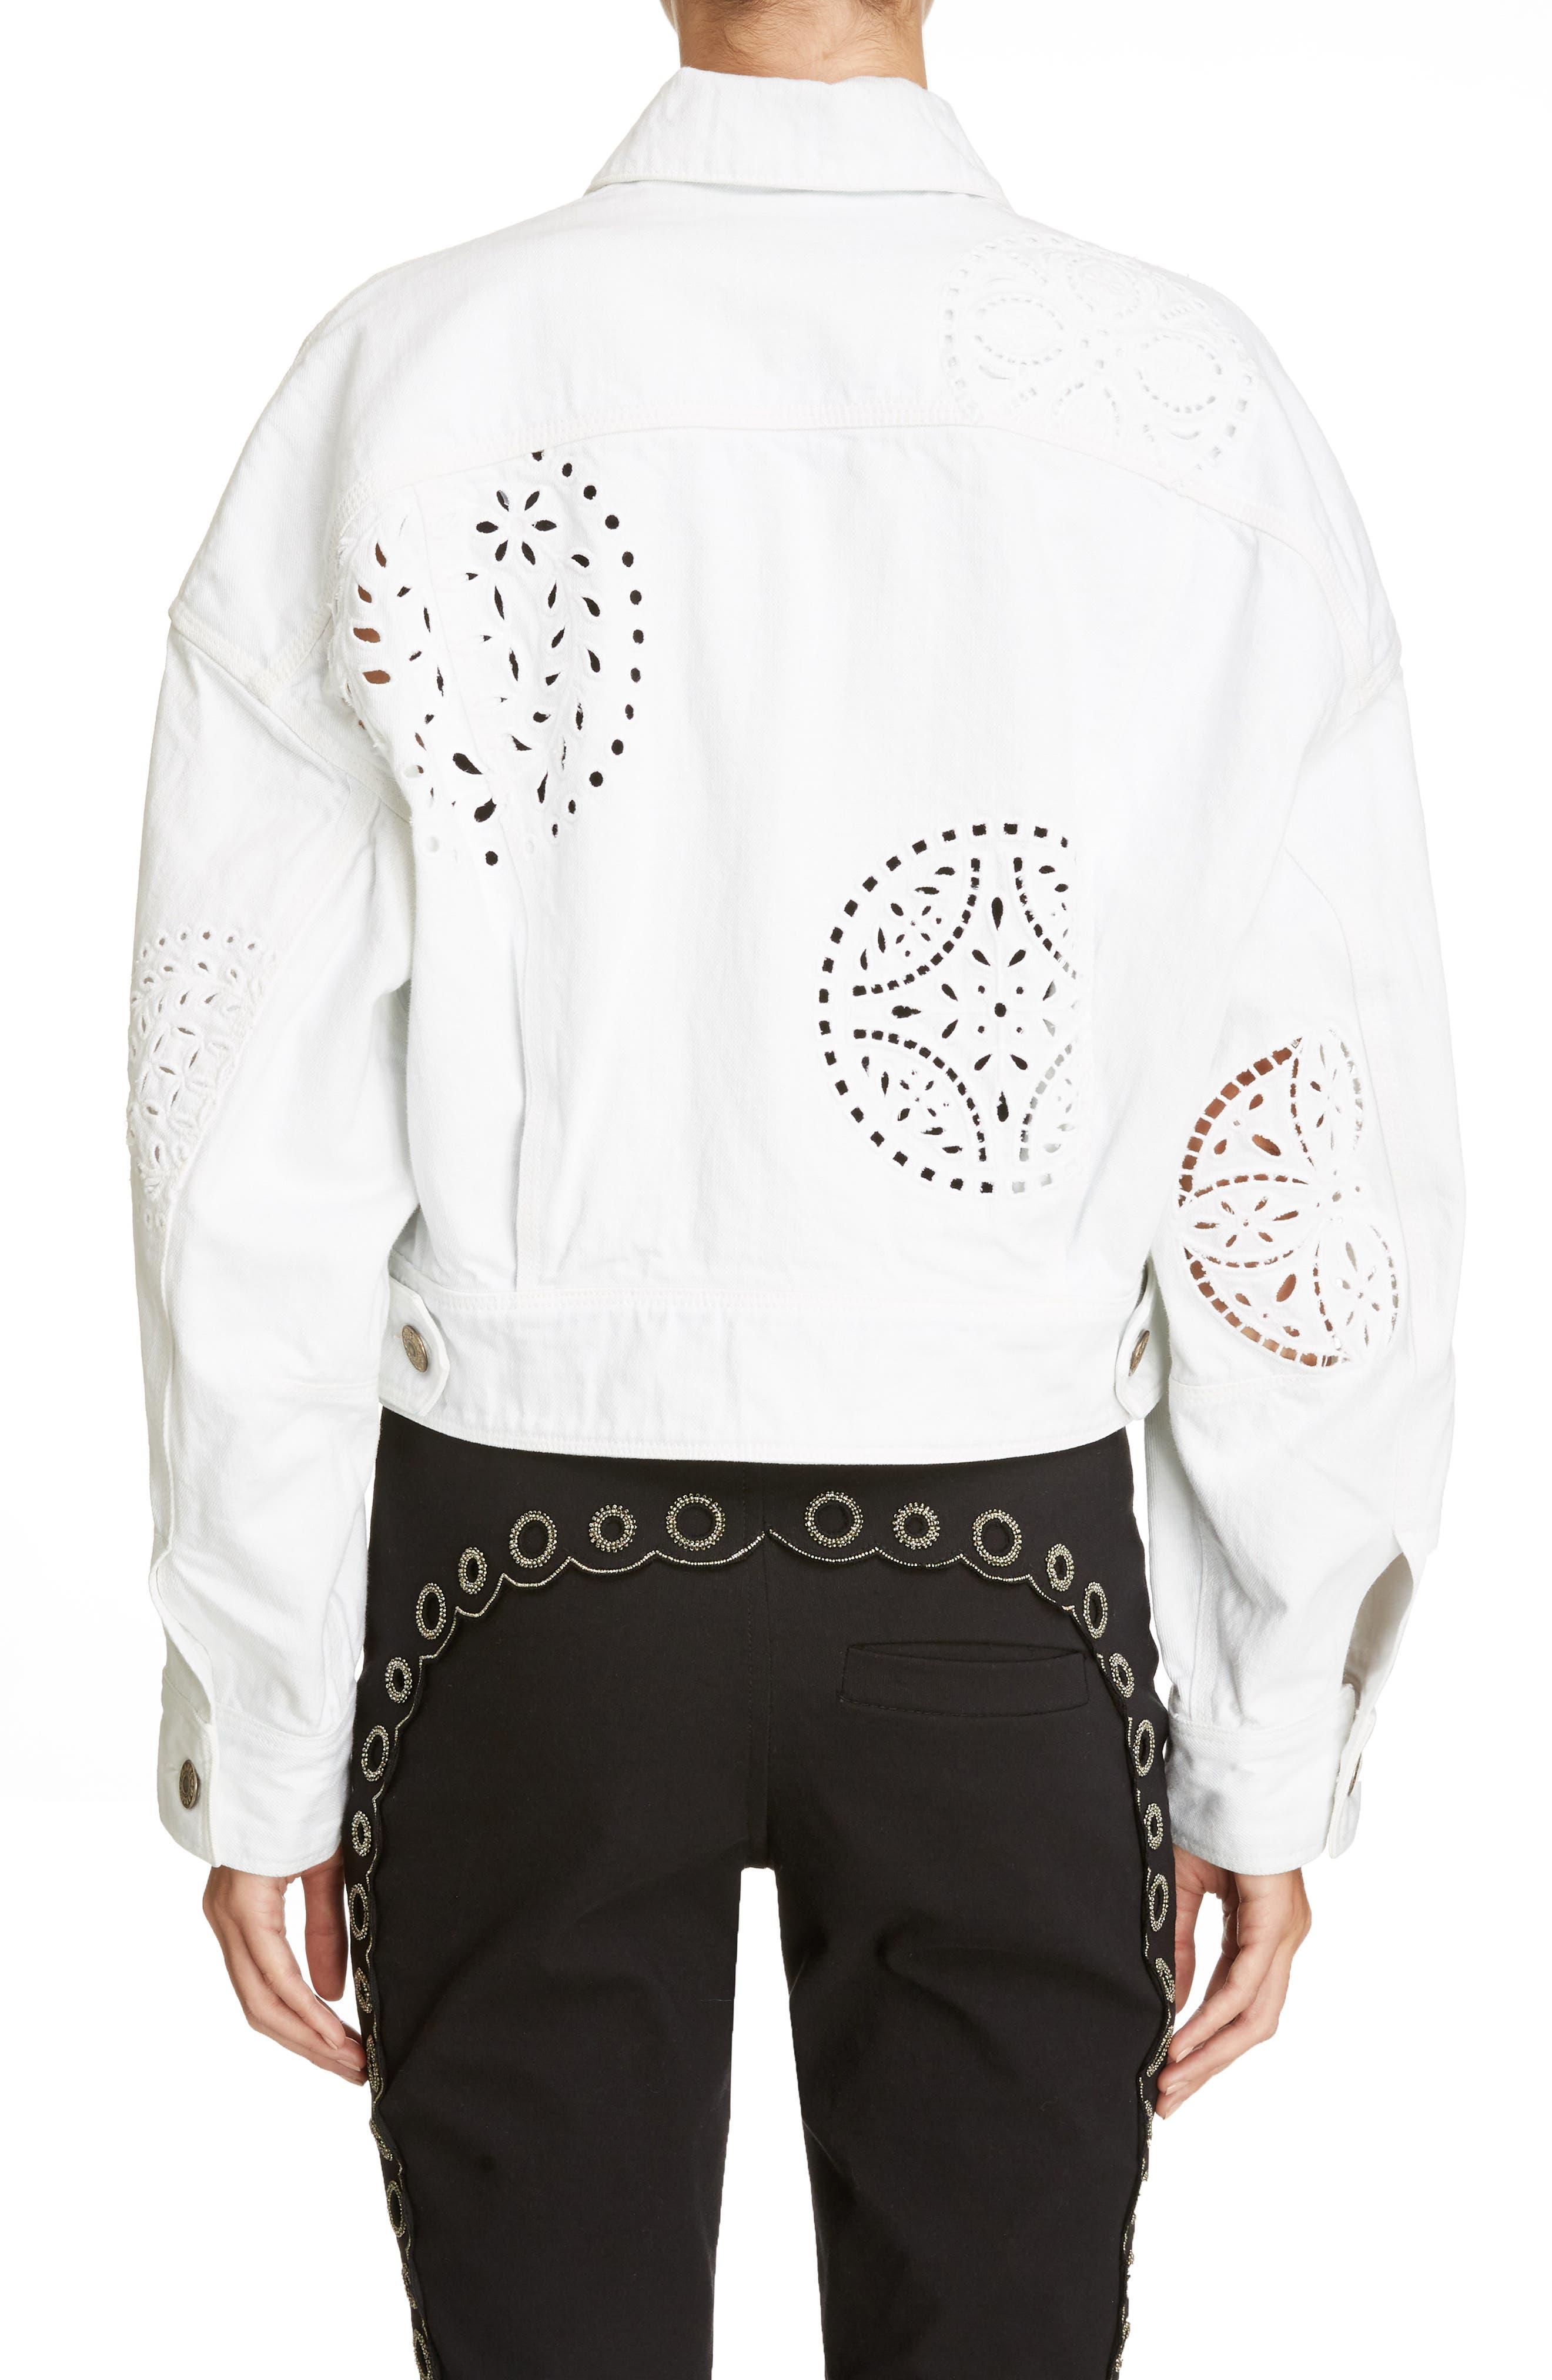 Broderie Anglaise Denim Jacket,                             Alternate thumbnail 2, color,                             White